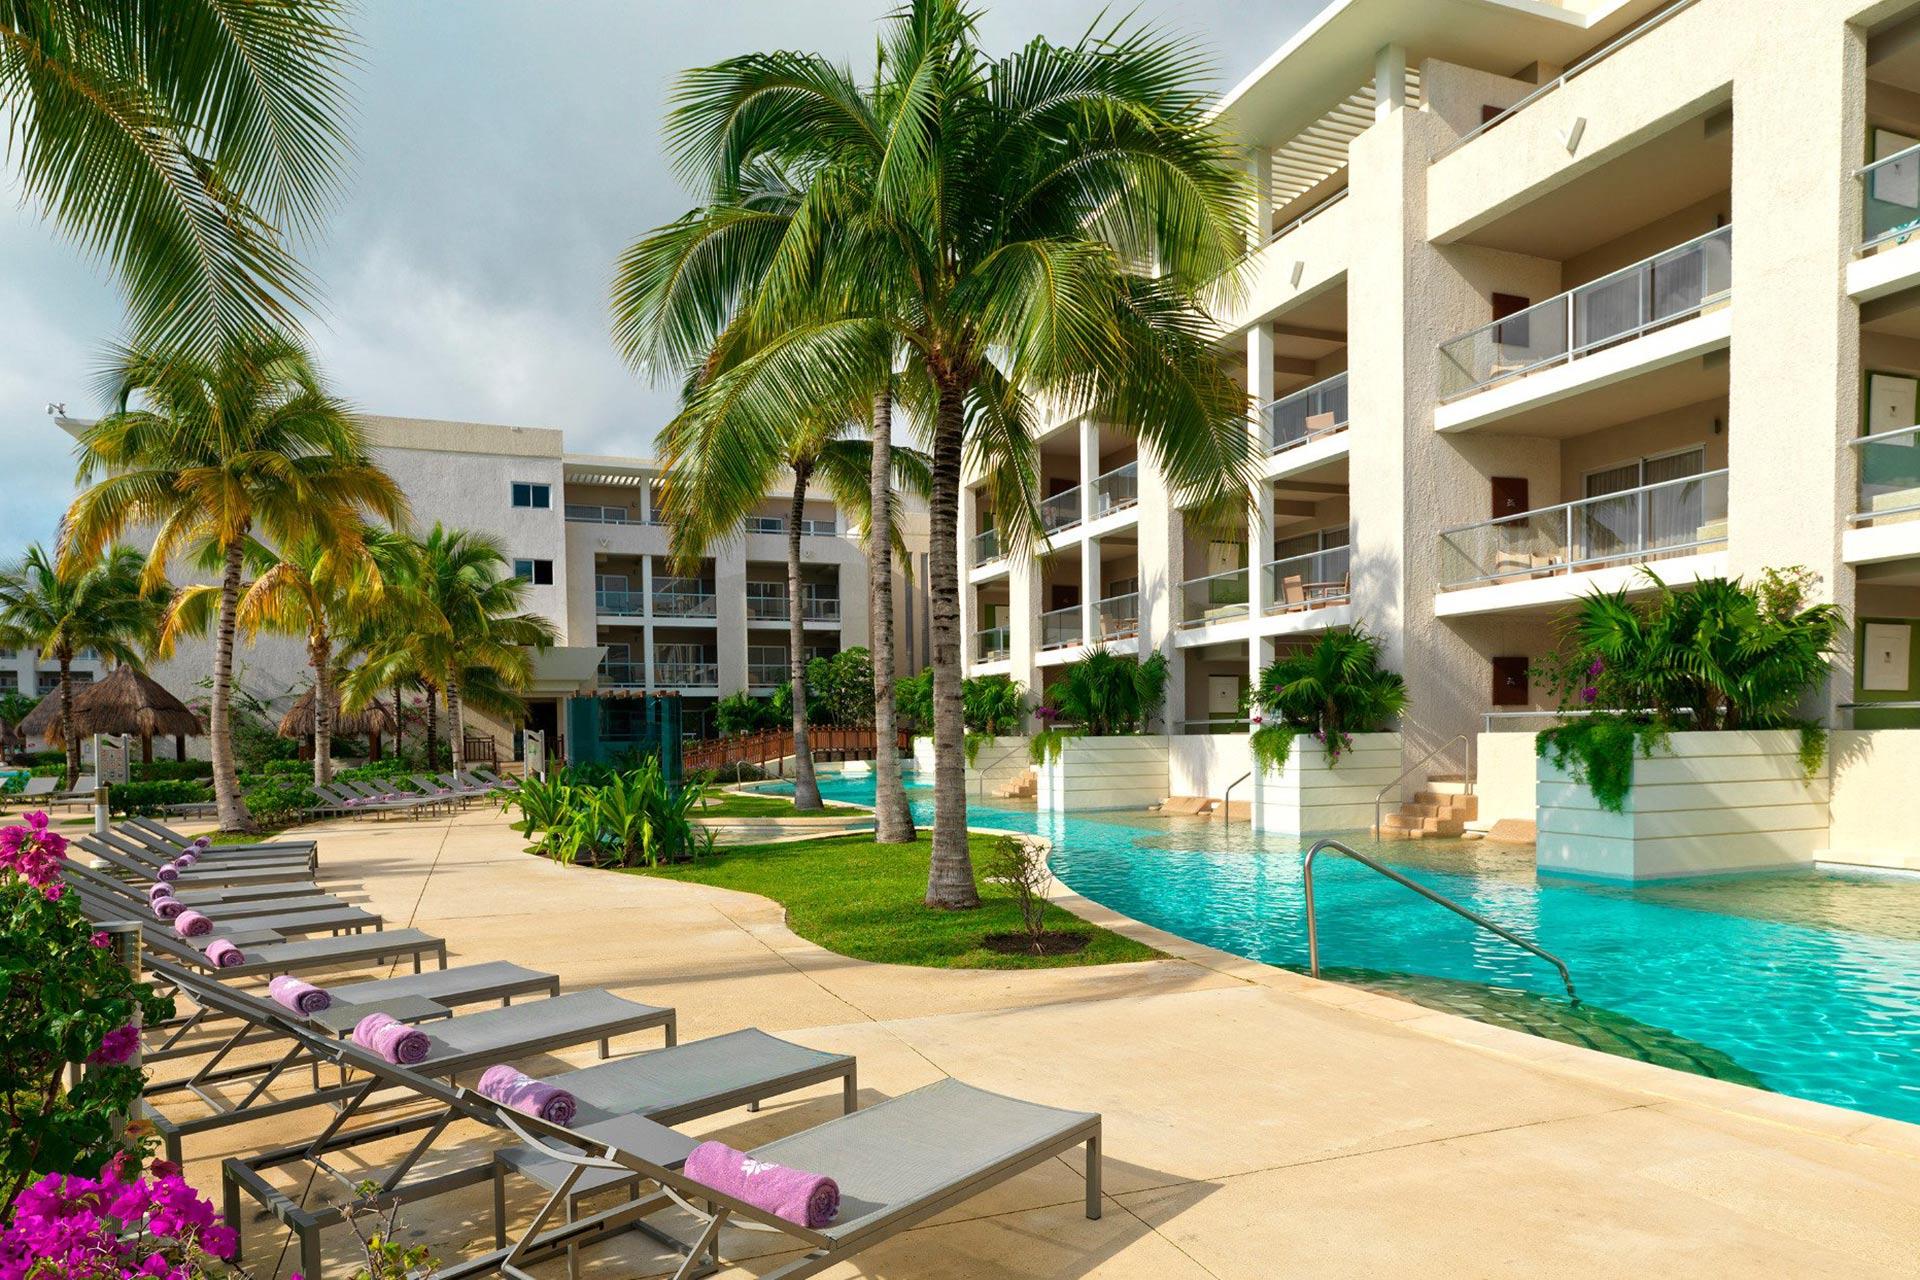 Swim-Up Suites at Paradisus Playa del Carmen La Esmeralda; Courtesy of Paradisus Playa del Carmen La Esmeralda